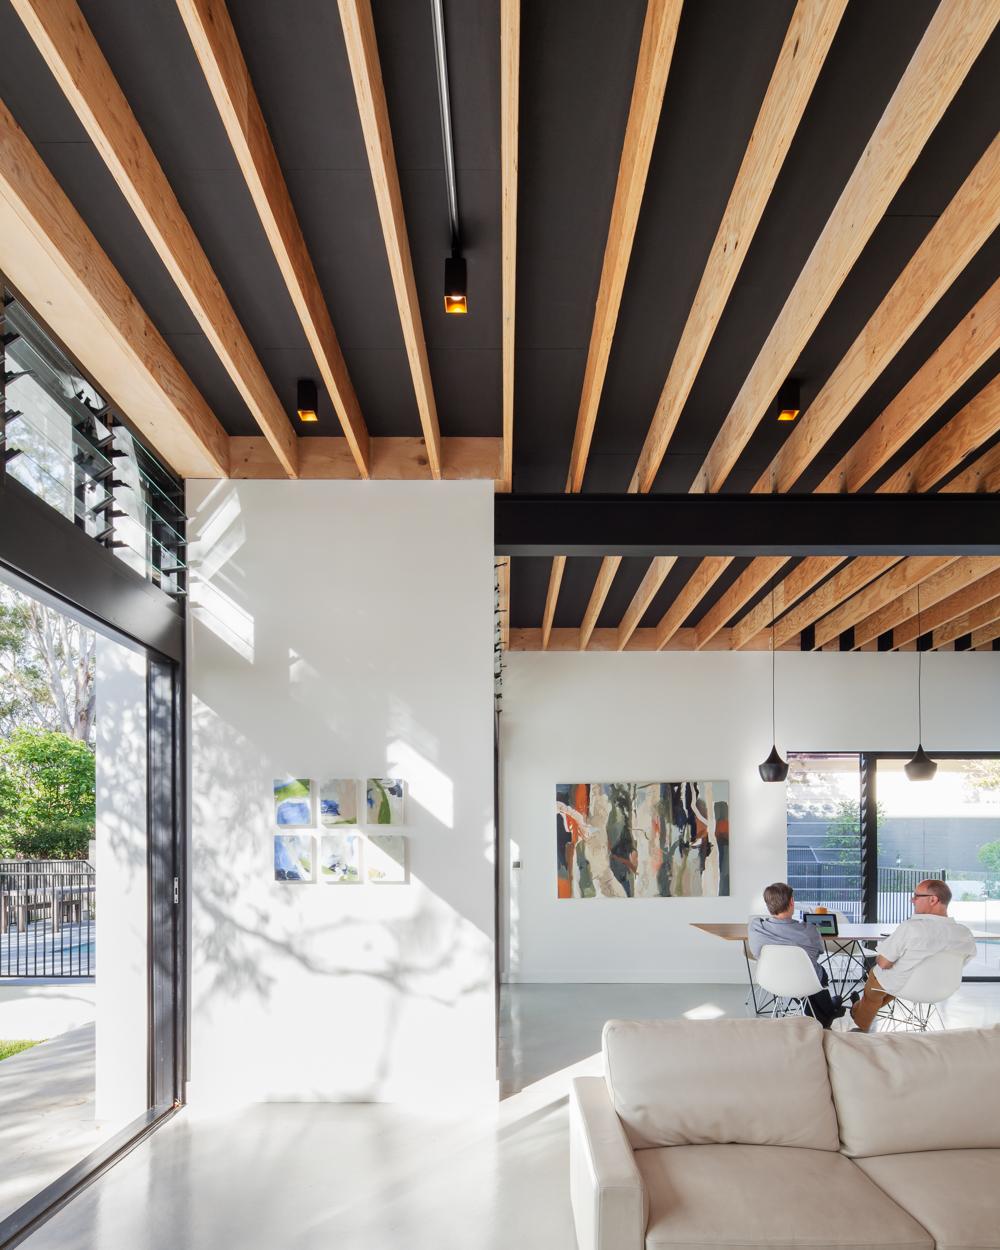 turramurra-house=noxon-giffen-architects-the-design-emotive--8.jpg